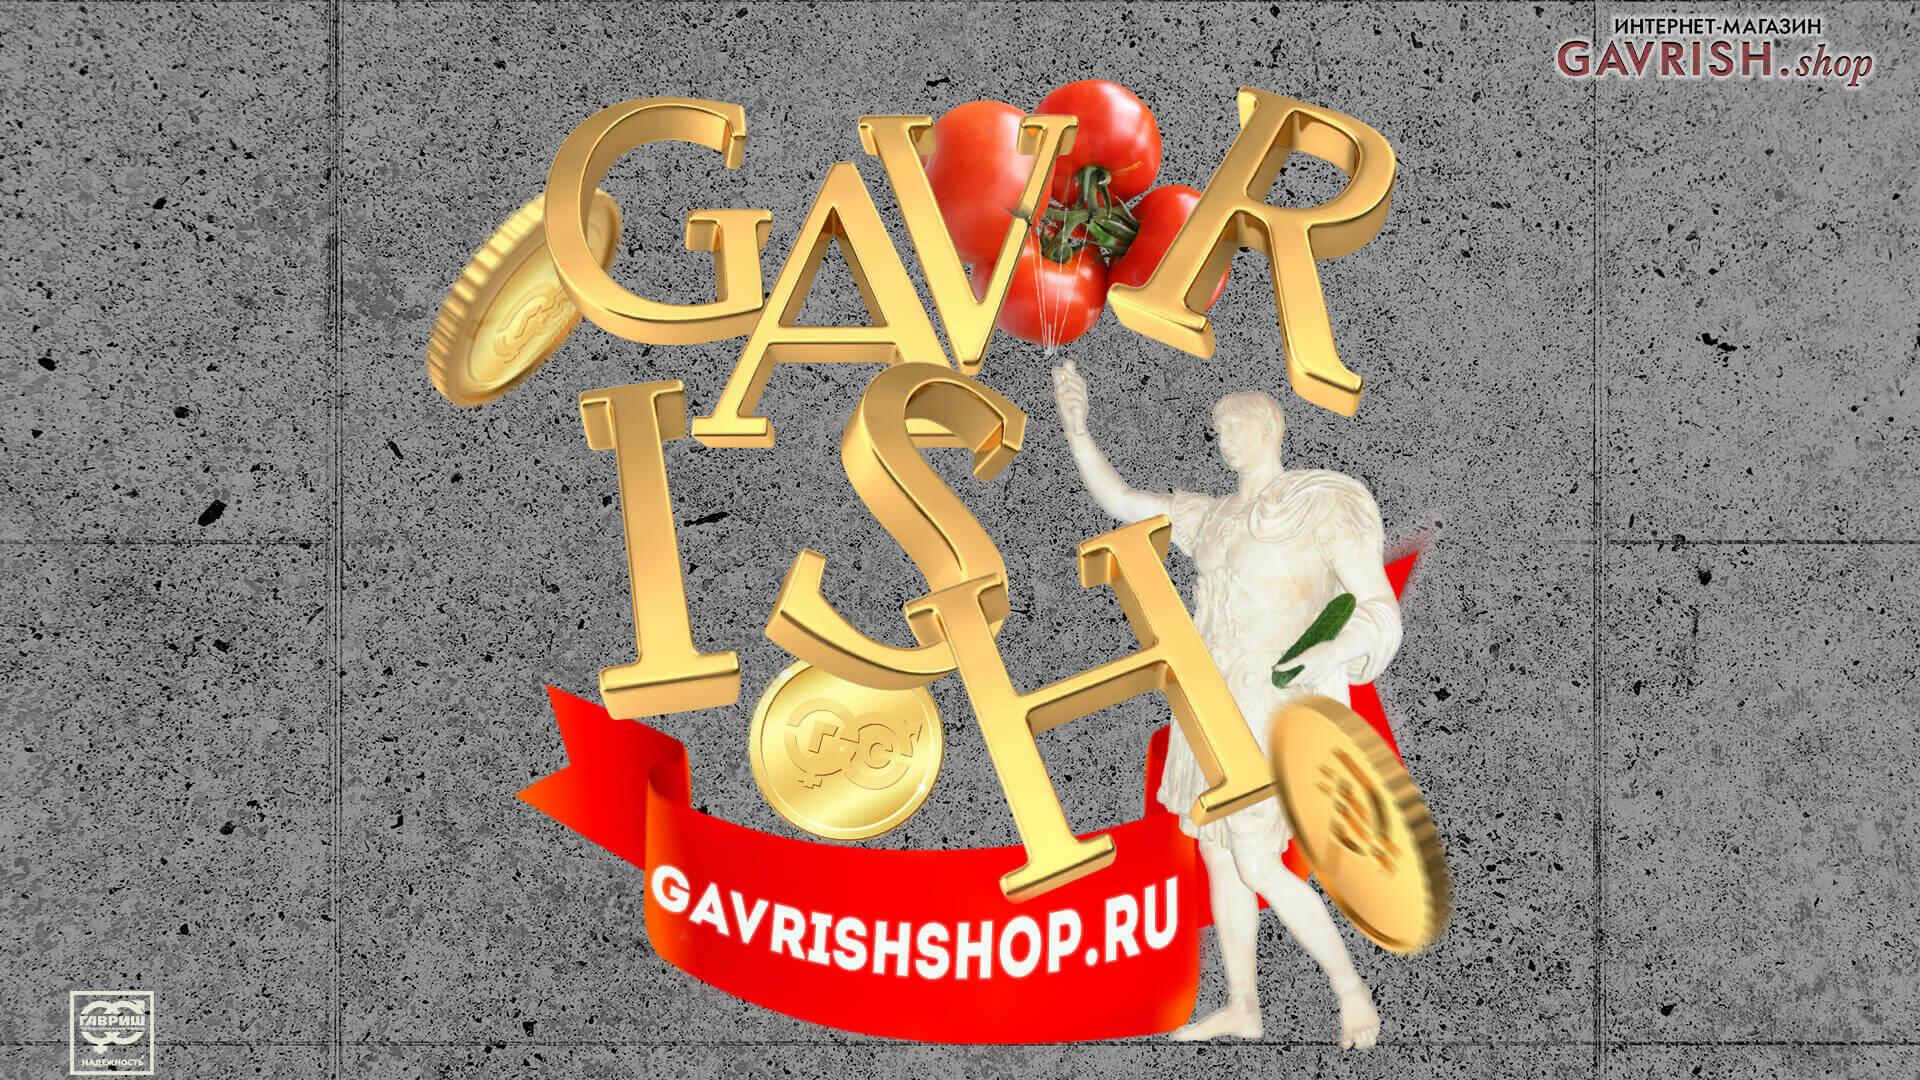 Вербена гибридная Кварц-ХР Ред виз Ай ЭС